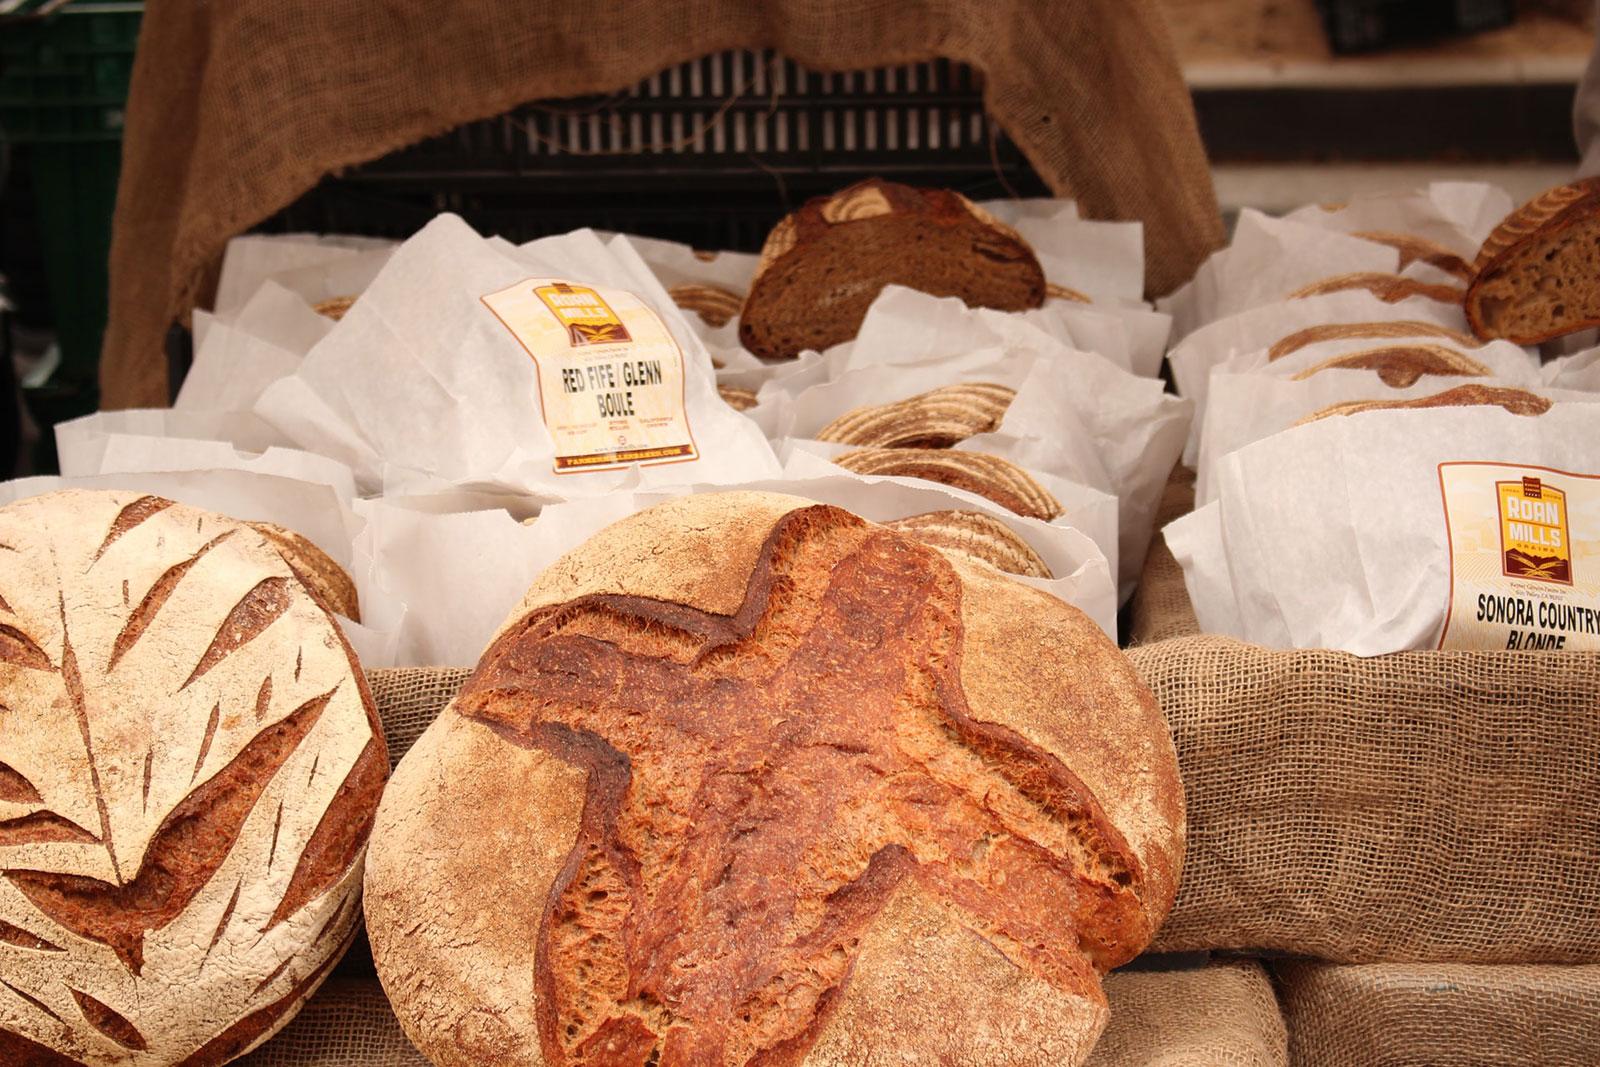 The Low-Waste Wonder of Sourdough Bread